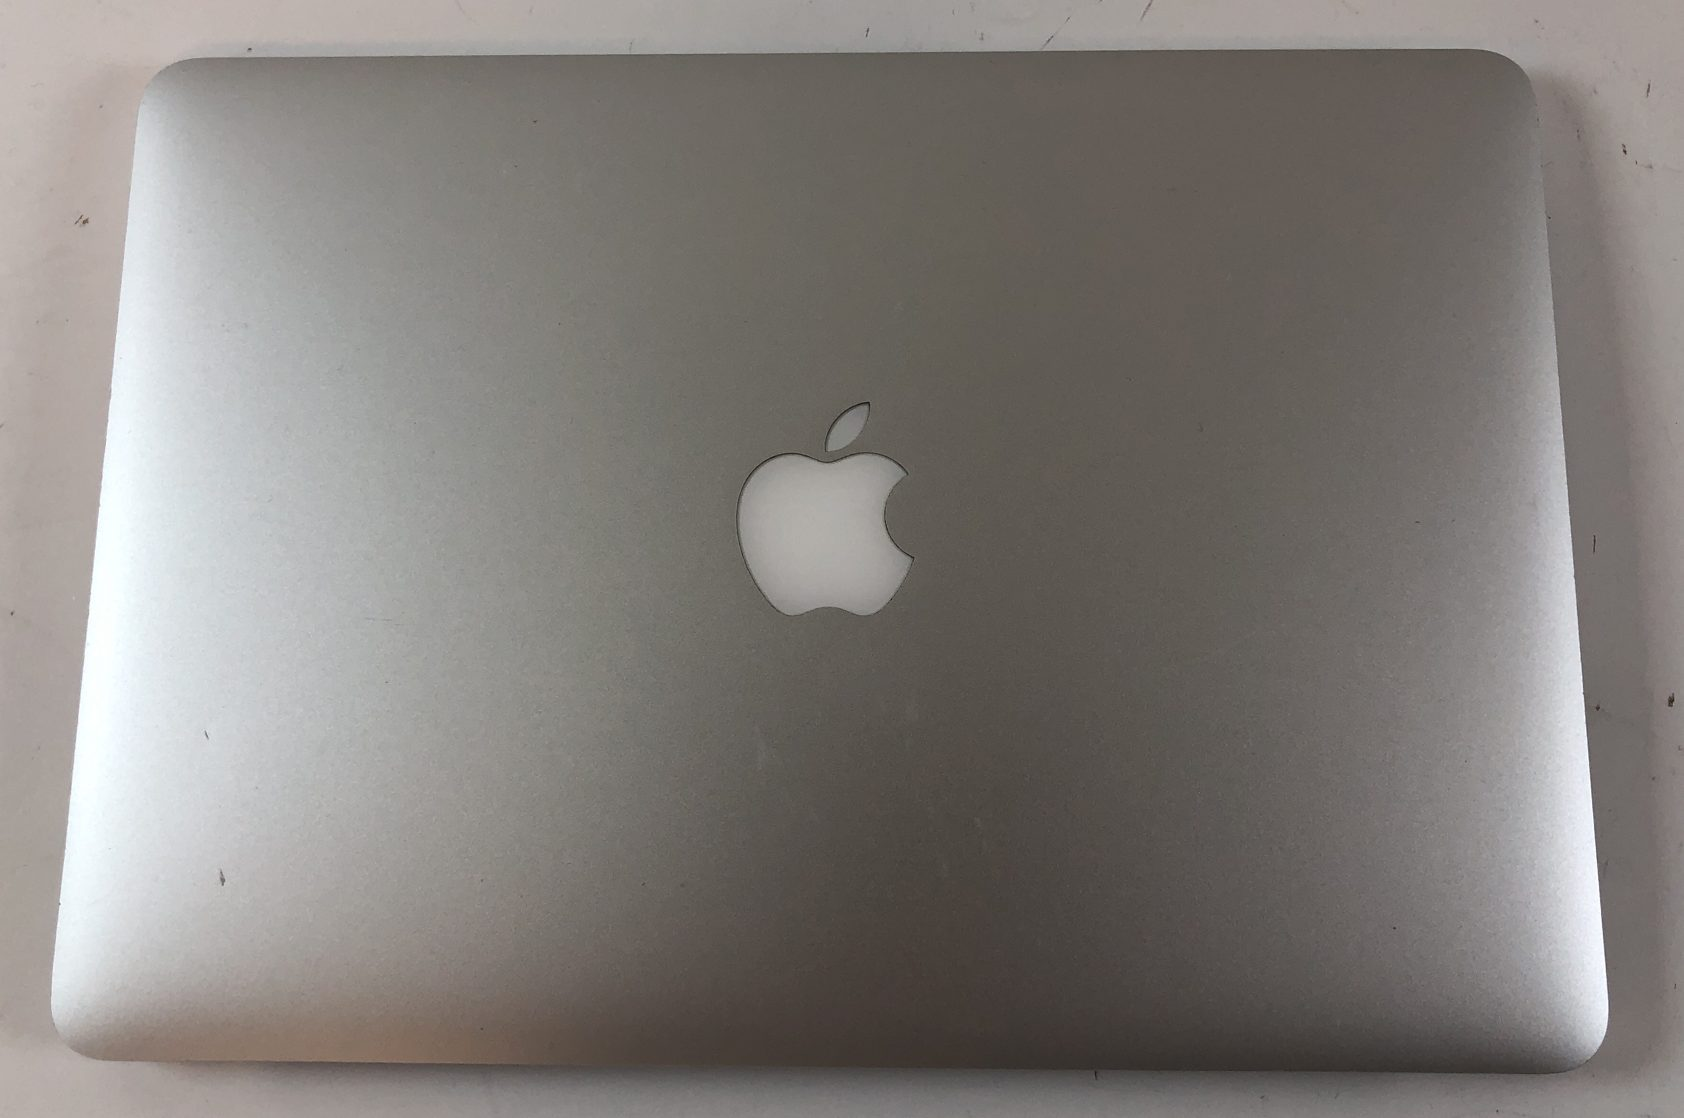 "MacBook Pro Retina 13"" Early 2015 (Intel Core i5 2.7 GHz 8 GB RAM 256 GB SSD), Intel Core i5 2.7 GHz, 8 GB RAM, 256 GB SSD, bild 1"